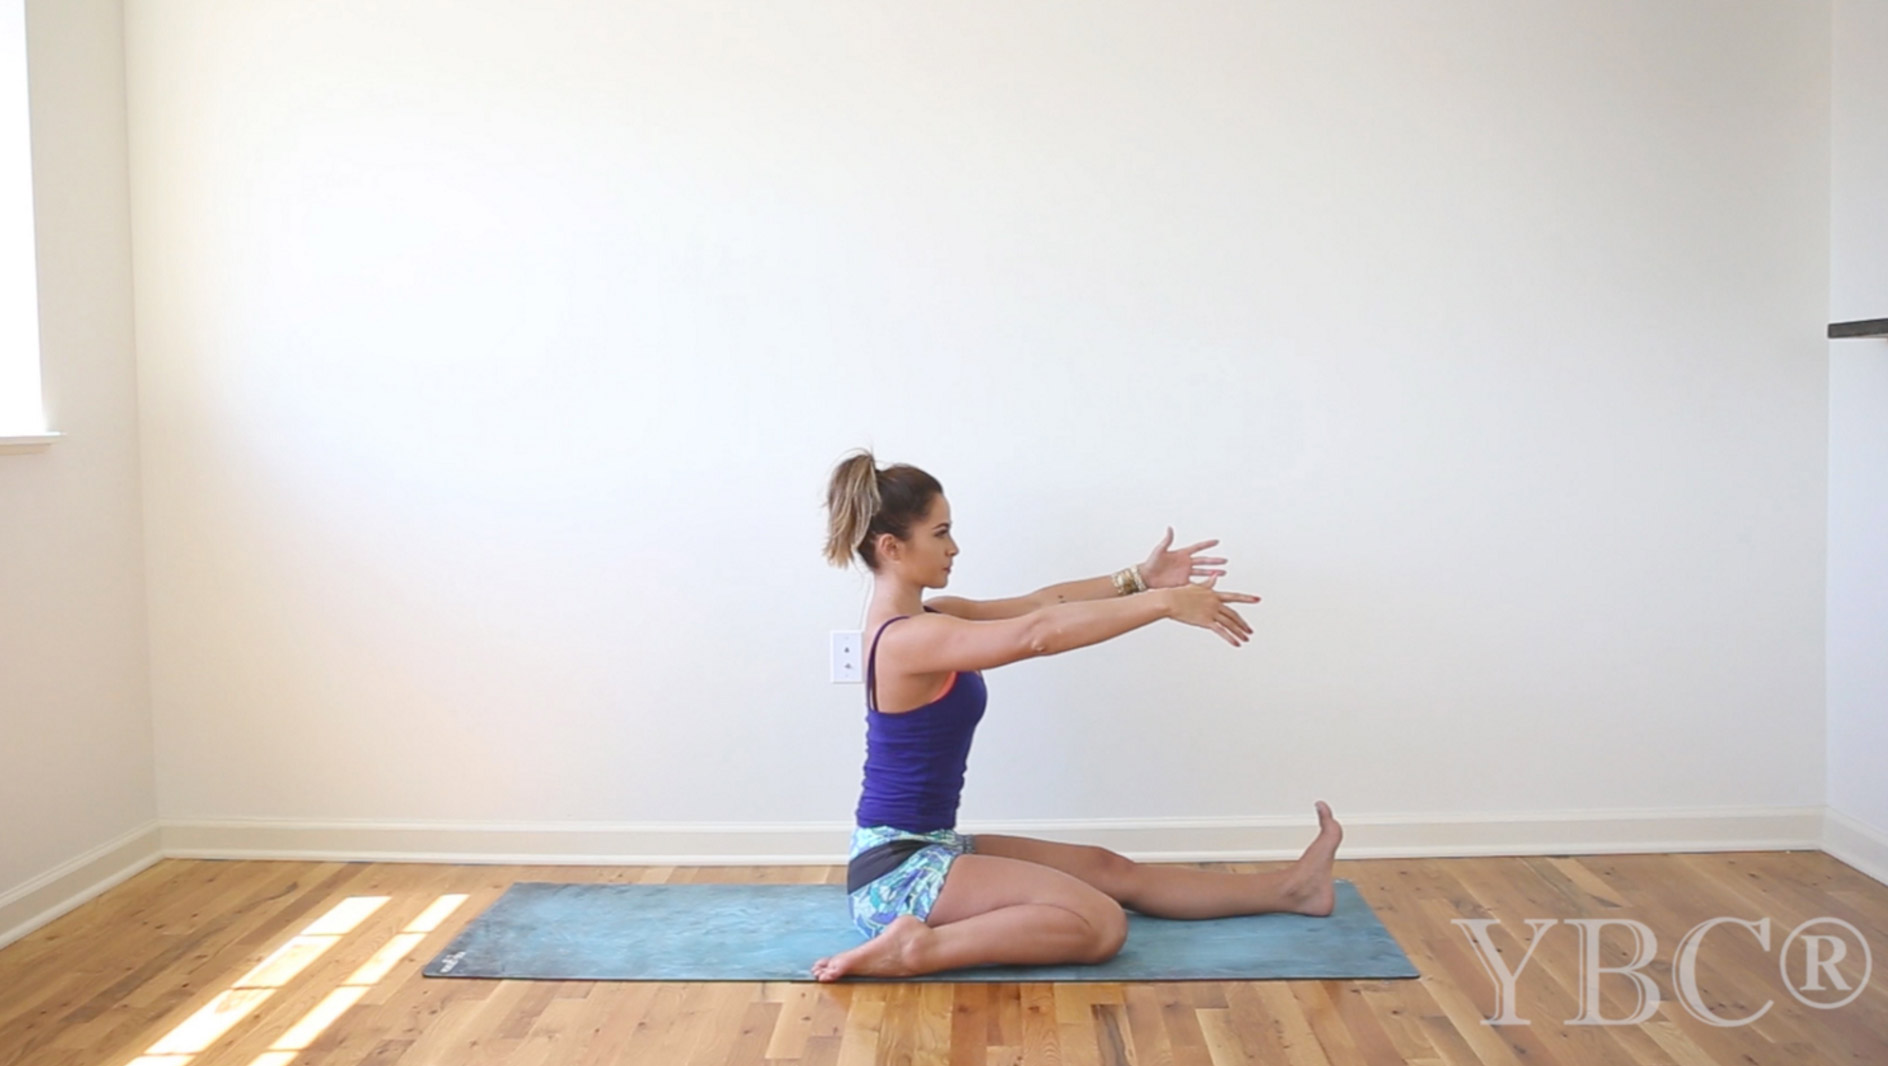 15 minute hip opening yoga practice  Wearing:  Maaji shorts  (on sale). Using:  Hot yoga mat .